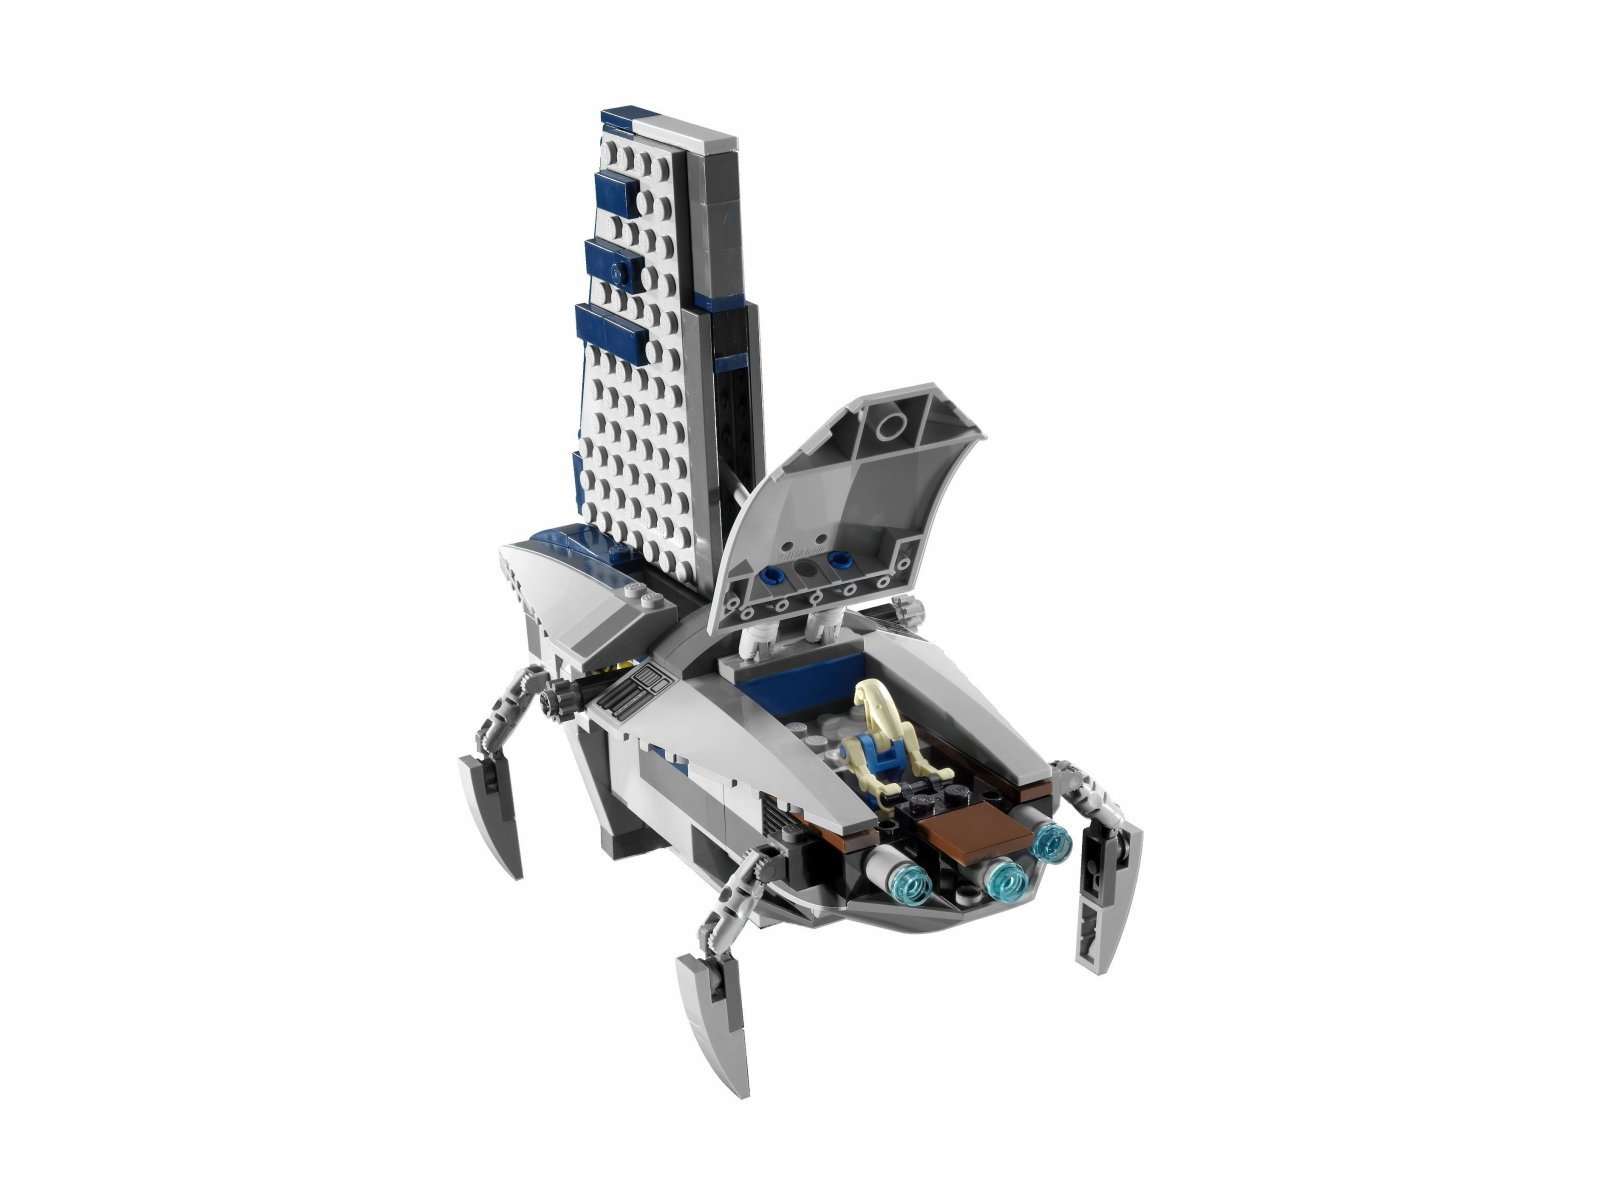 LEGO 8036 Separatist Shuttle™